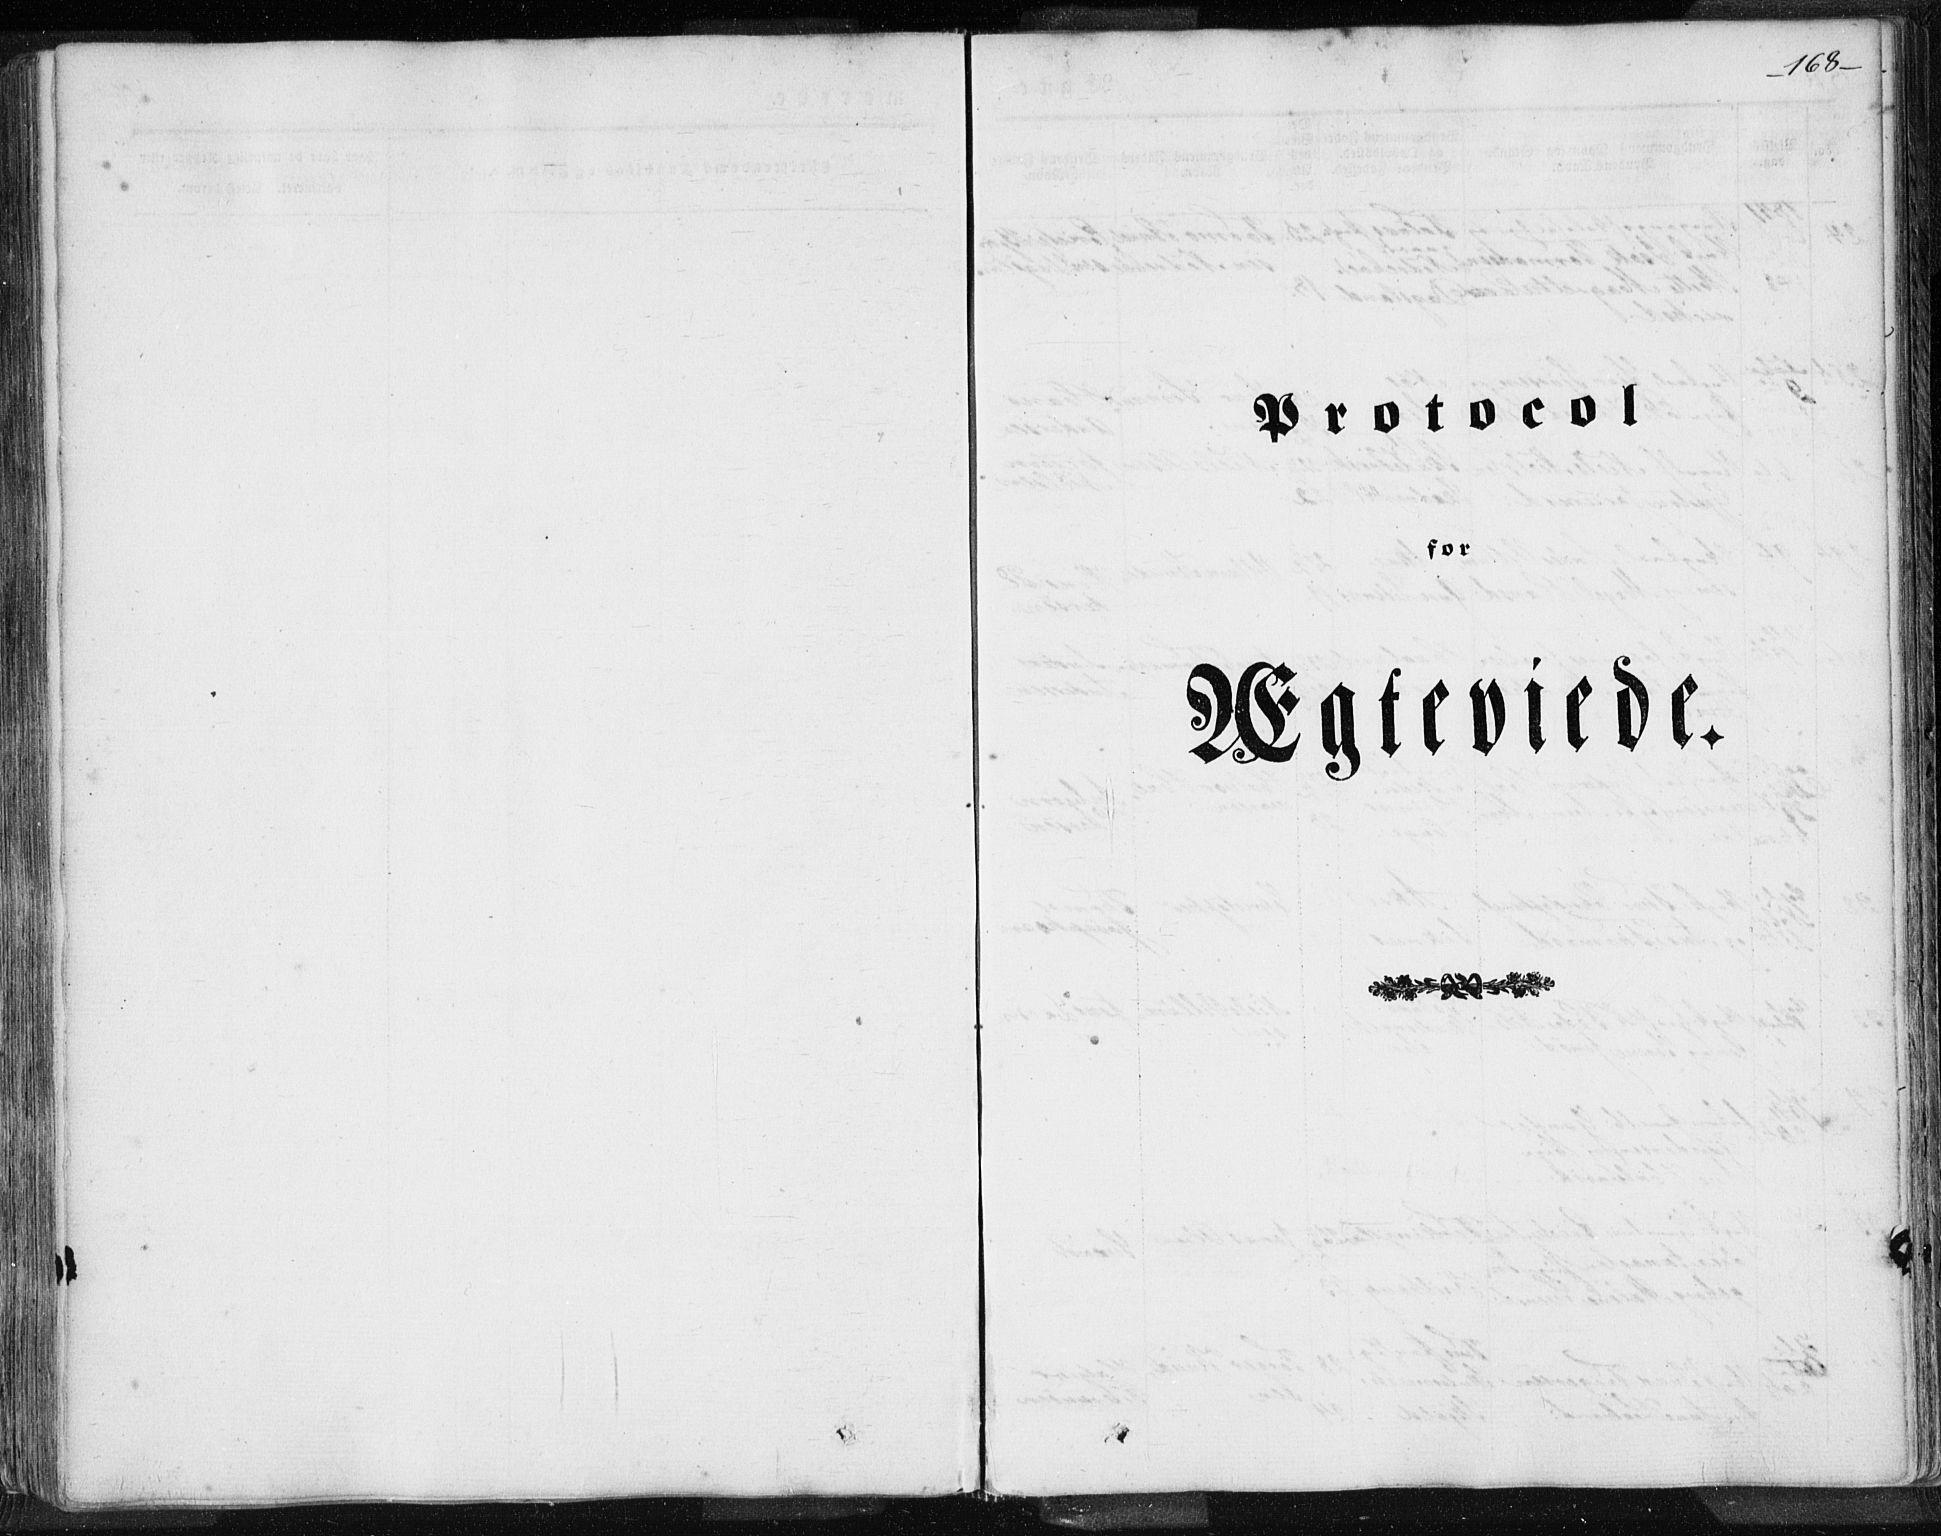 SAST, Skudenes sokneprestkontor, H/Ha/Haa/L0002: Ministerialbok nr. A 2.1, 1841-1846, s. 168